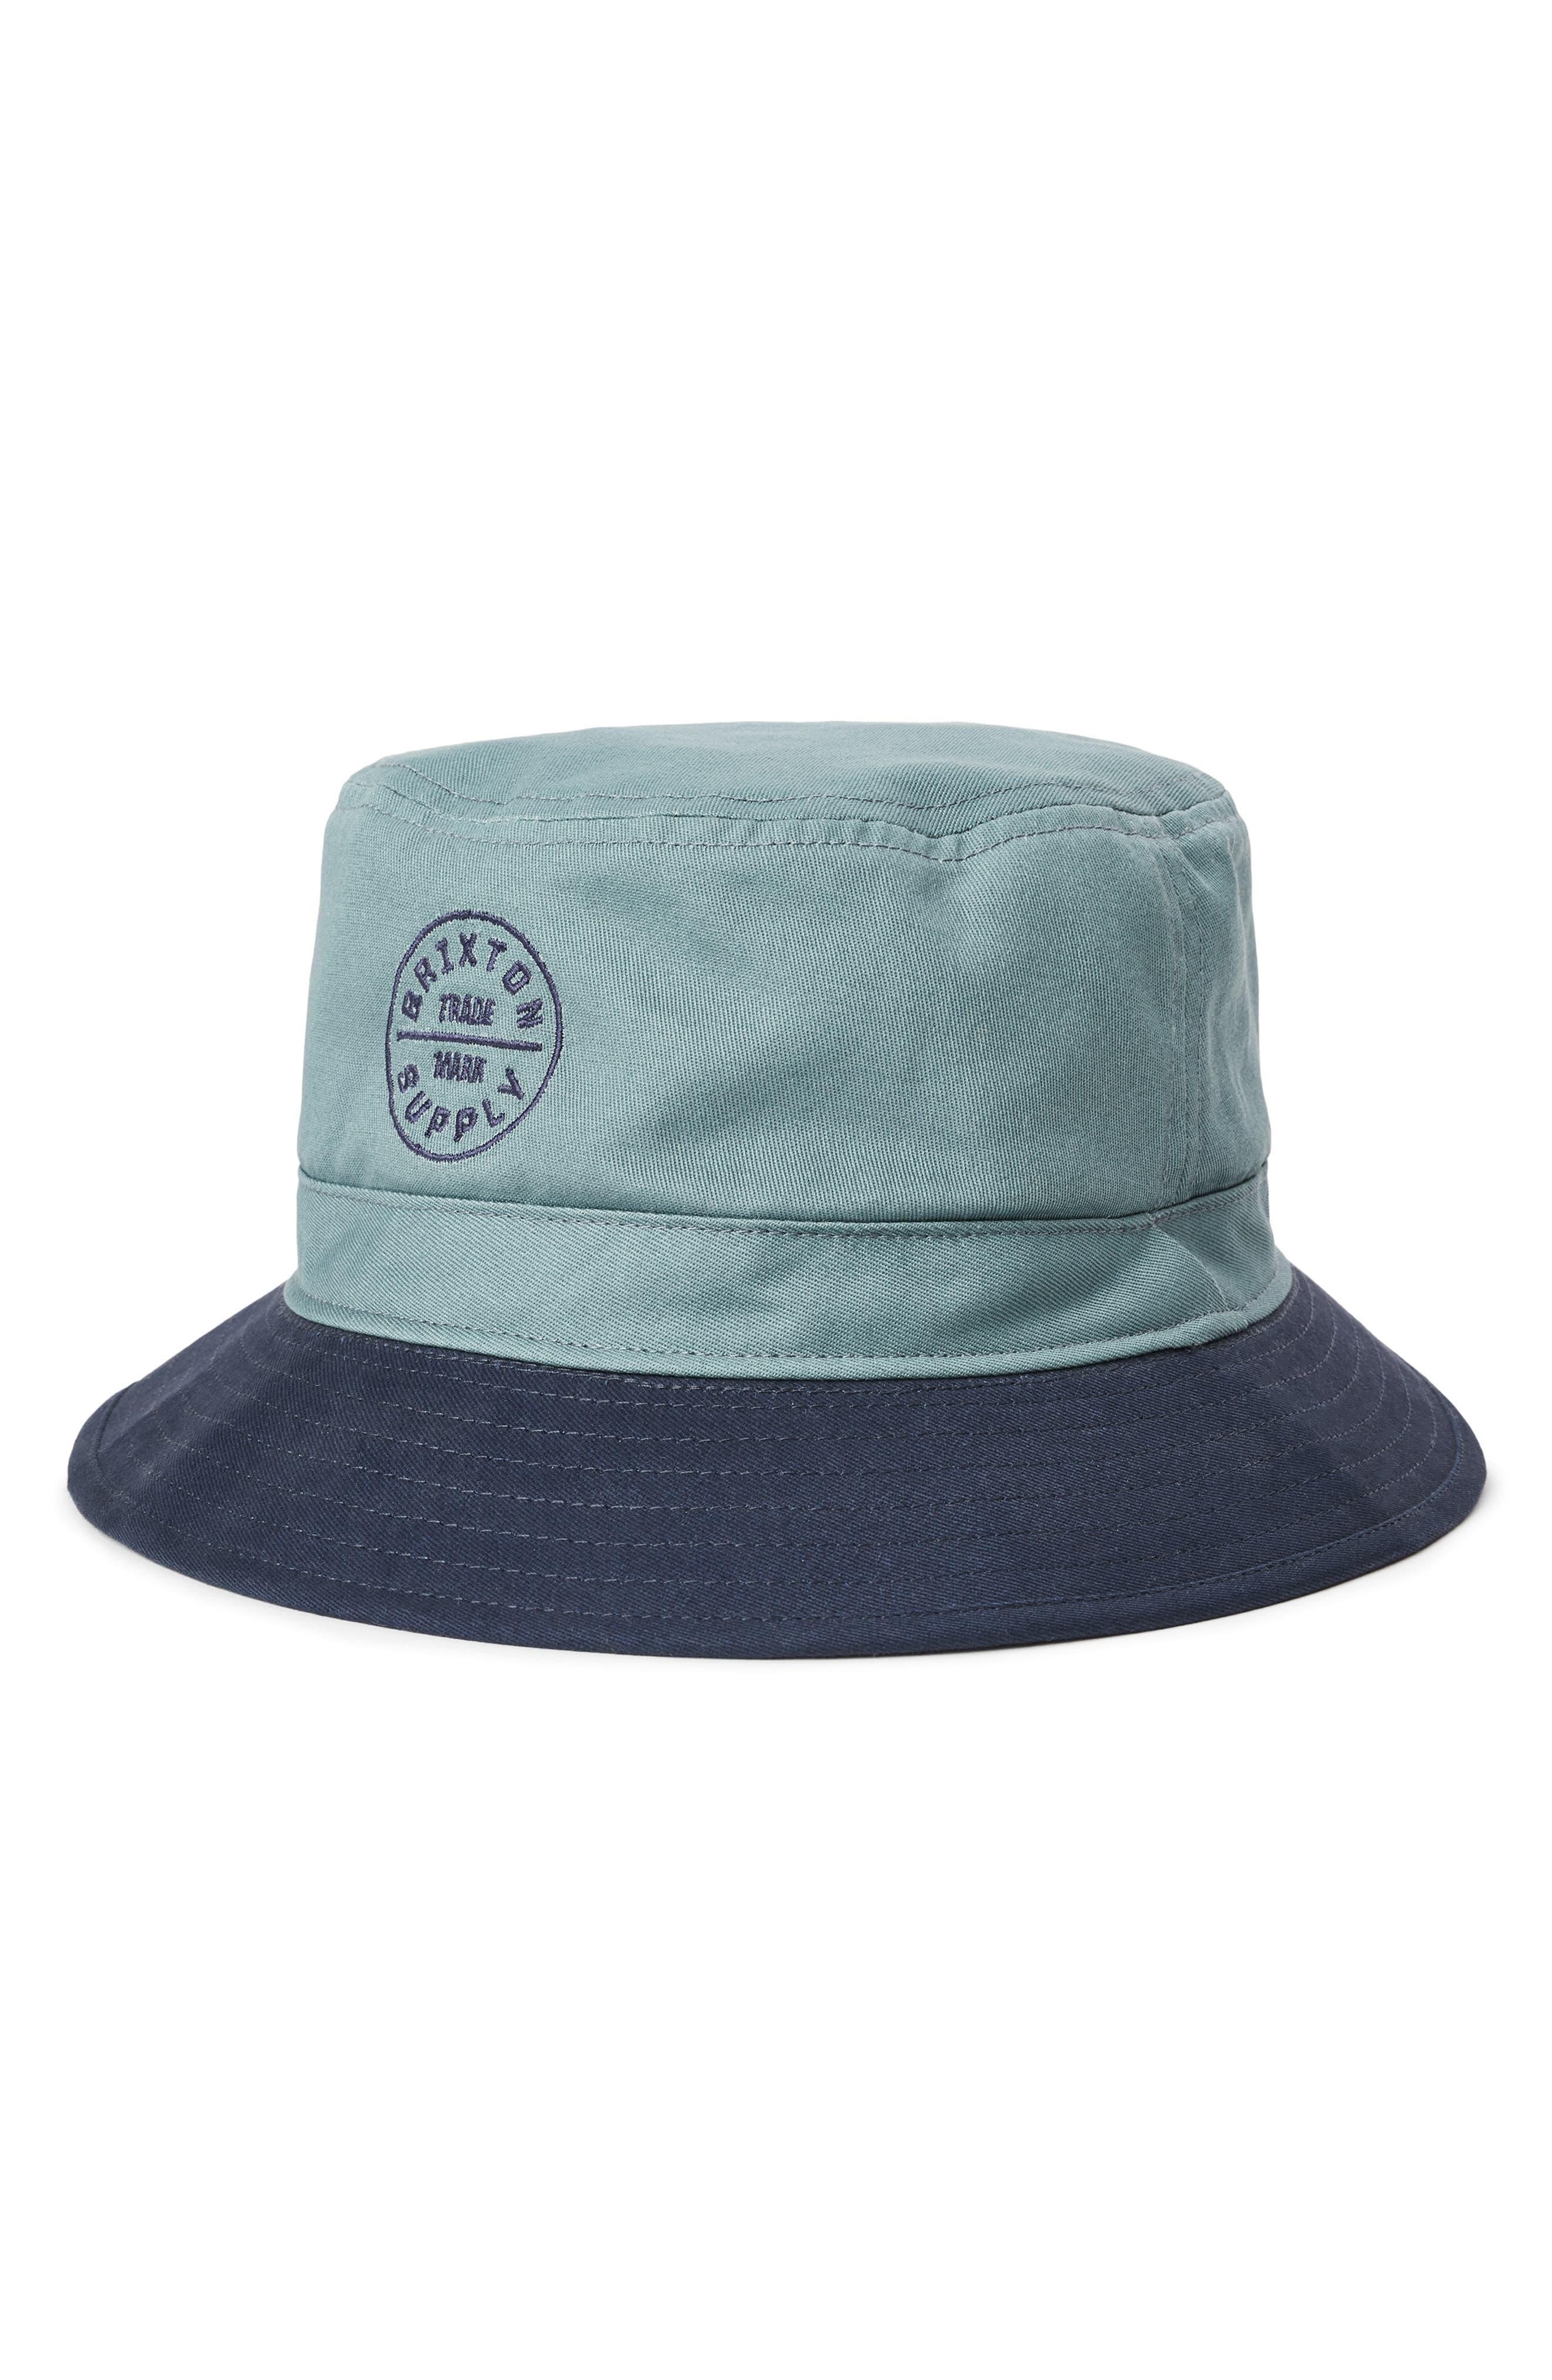 75882c13bc Men's Hats, Hats for Men   Nordstrom